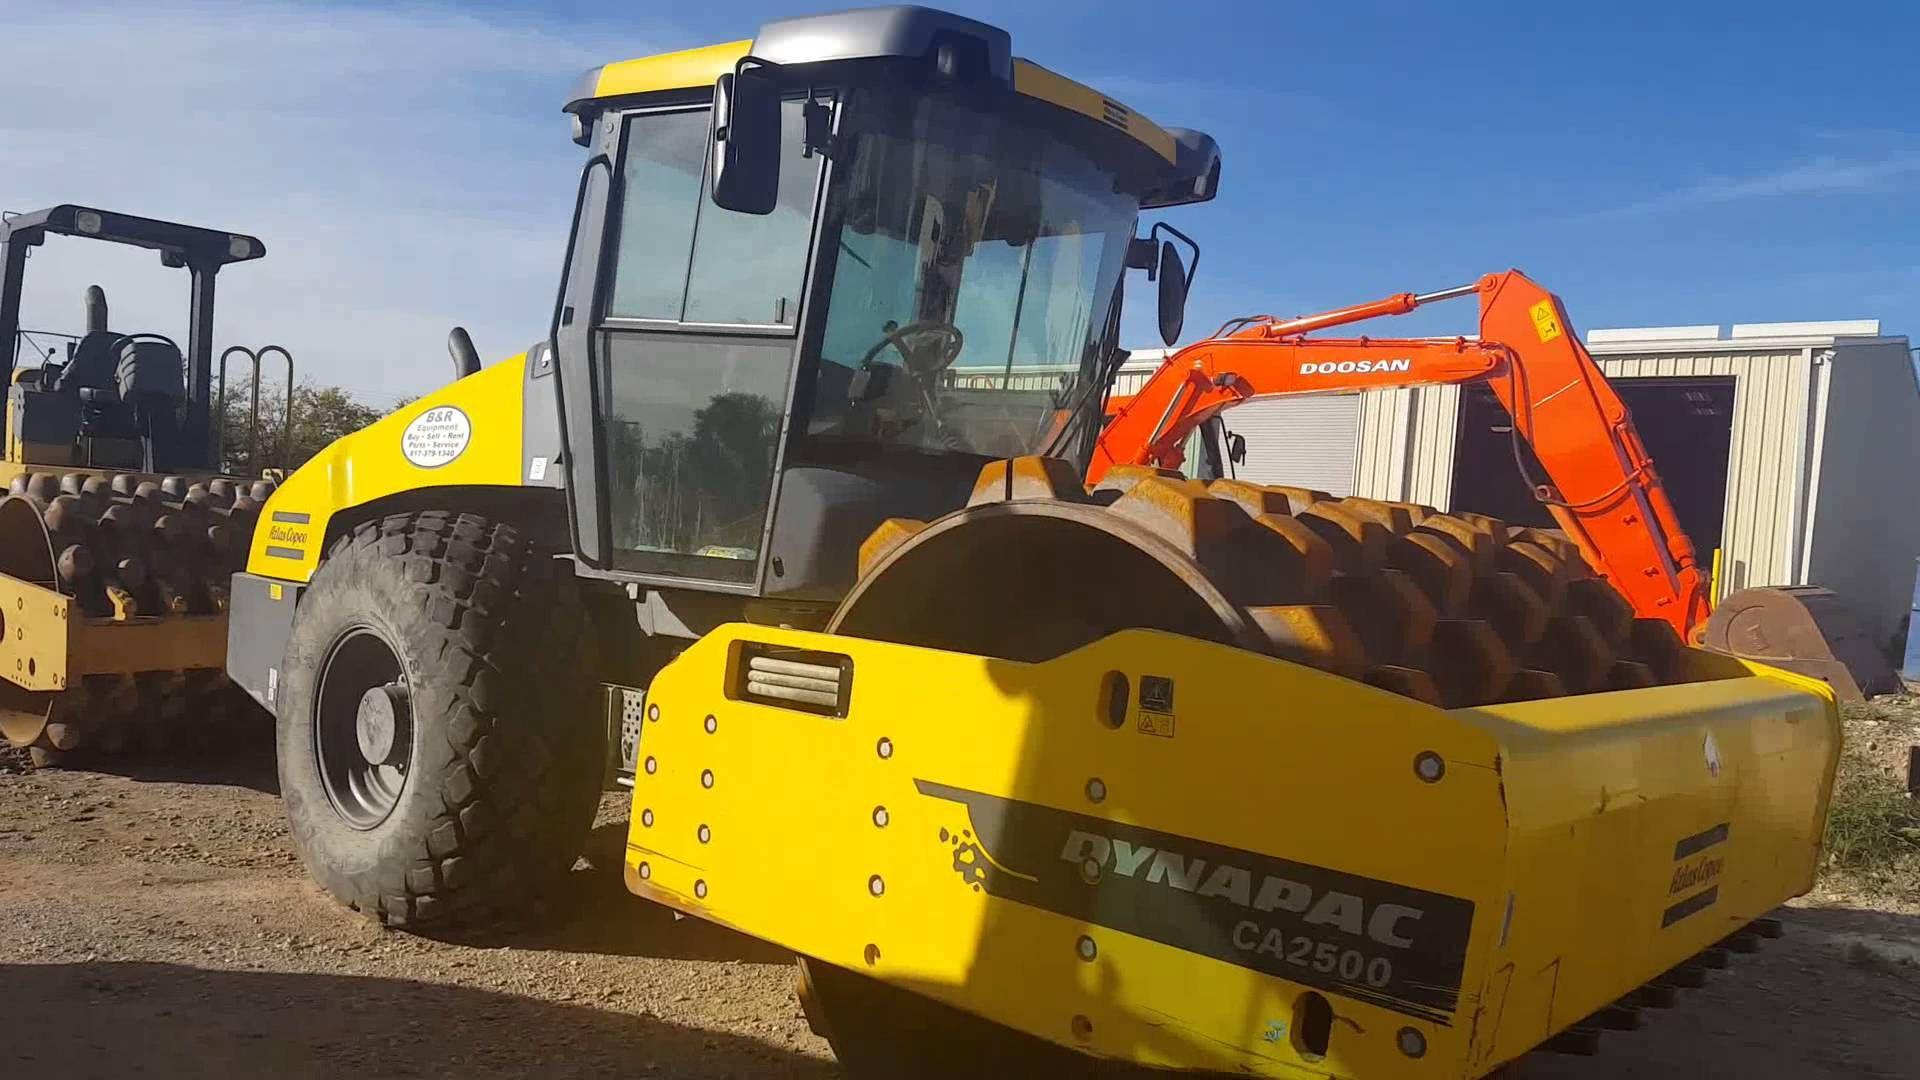 Heavy Construction Equipment Rollers heavyequipment